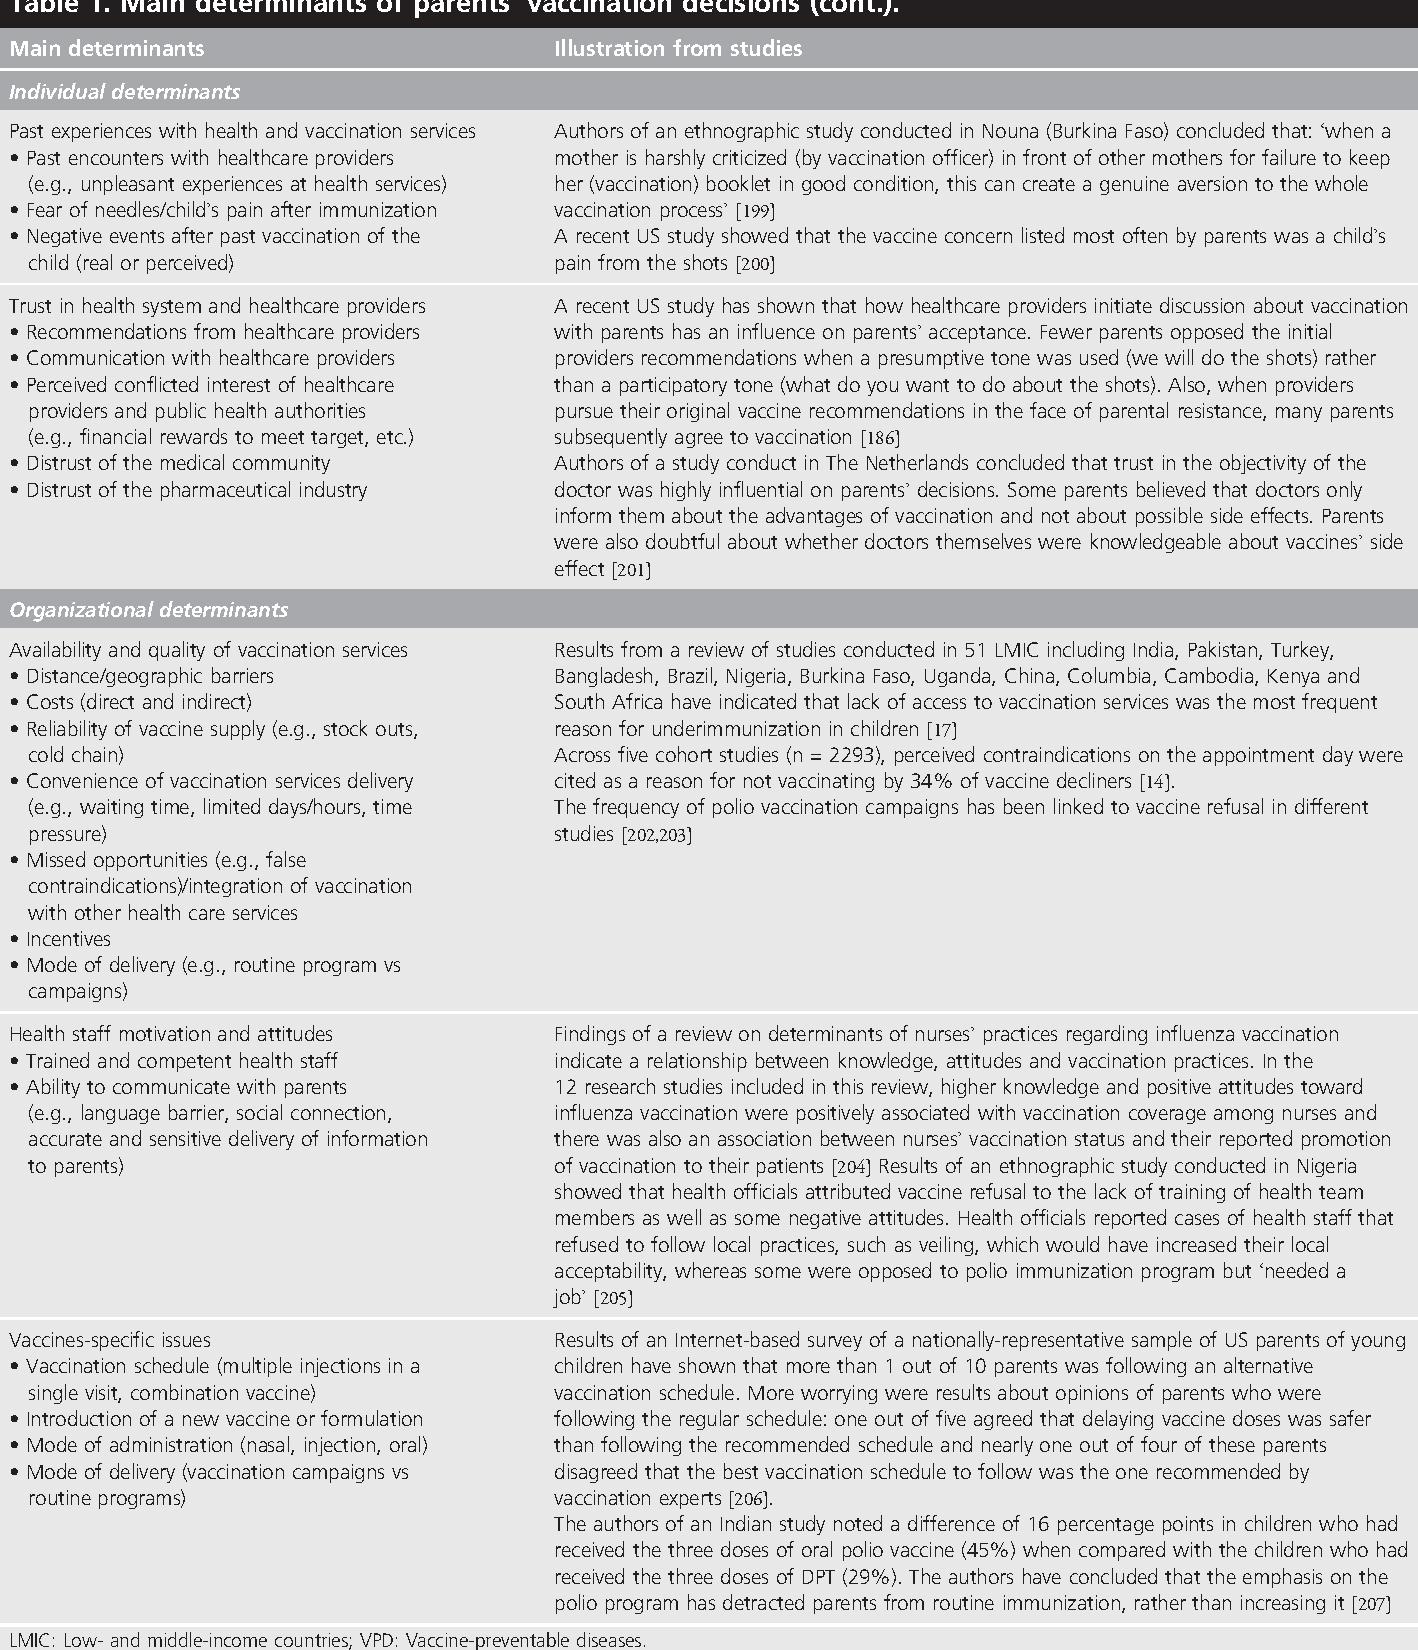 Vaccine hesitancy, vaccine refusal and the anti-vaccine